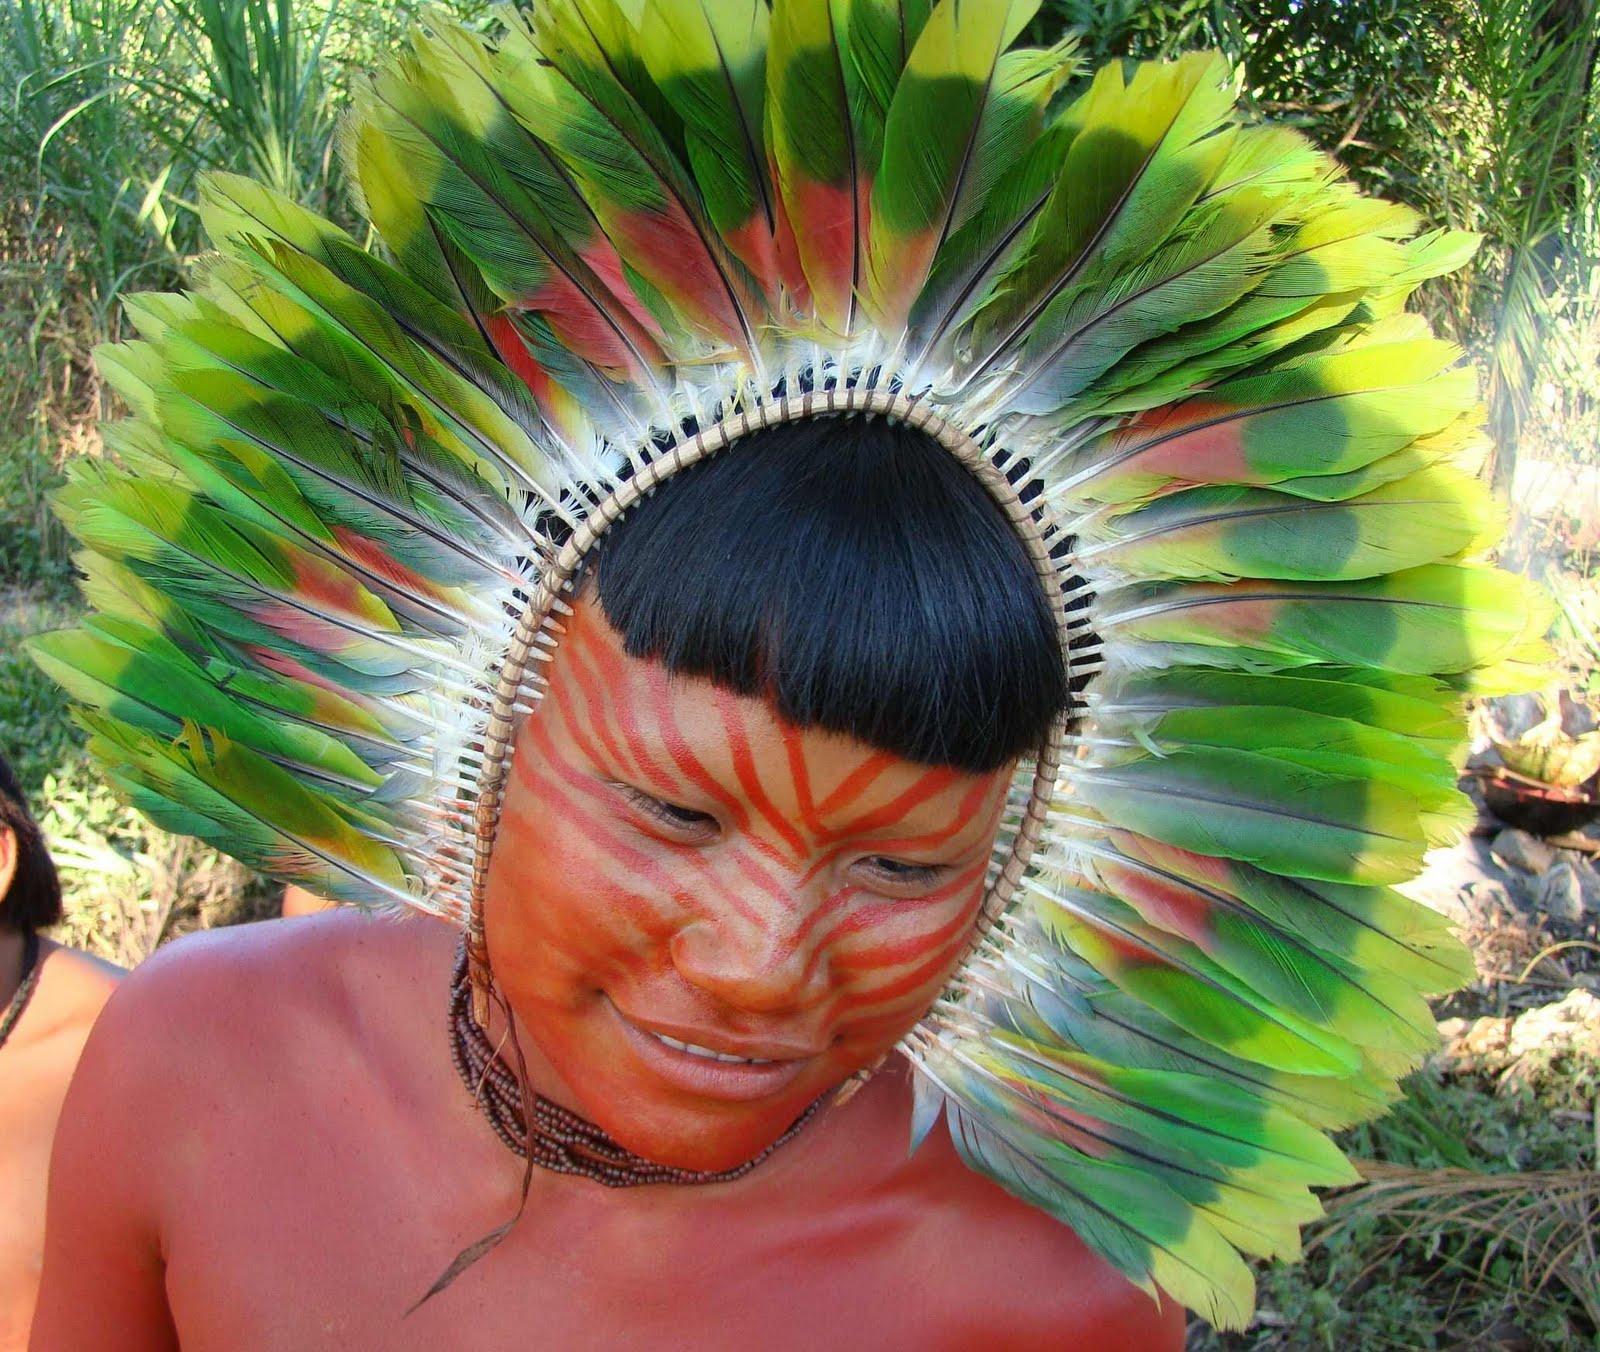 Amazon: Wildlife, History And Adventure In The Amazon: June 2011